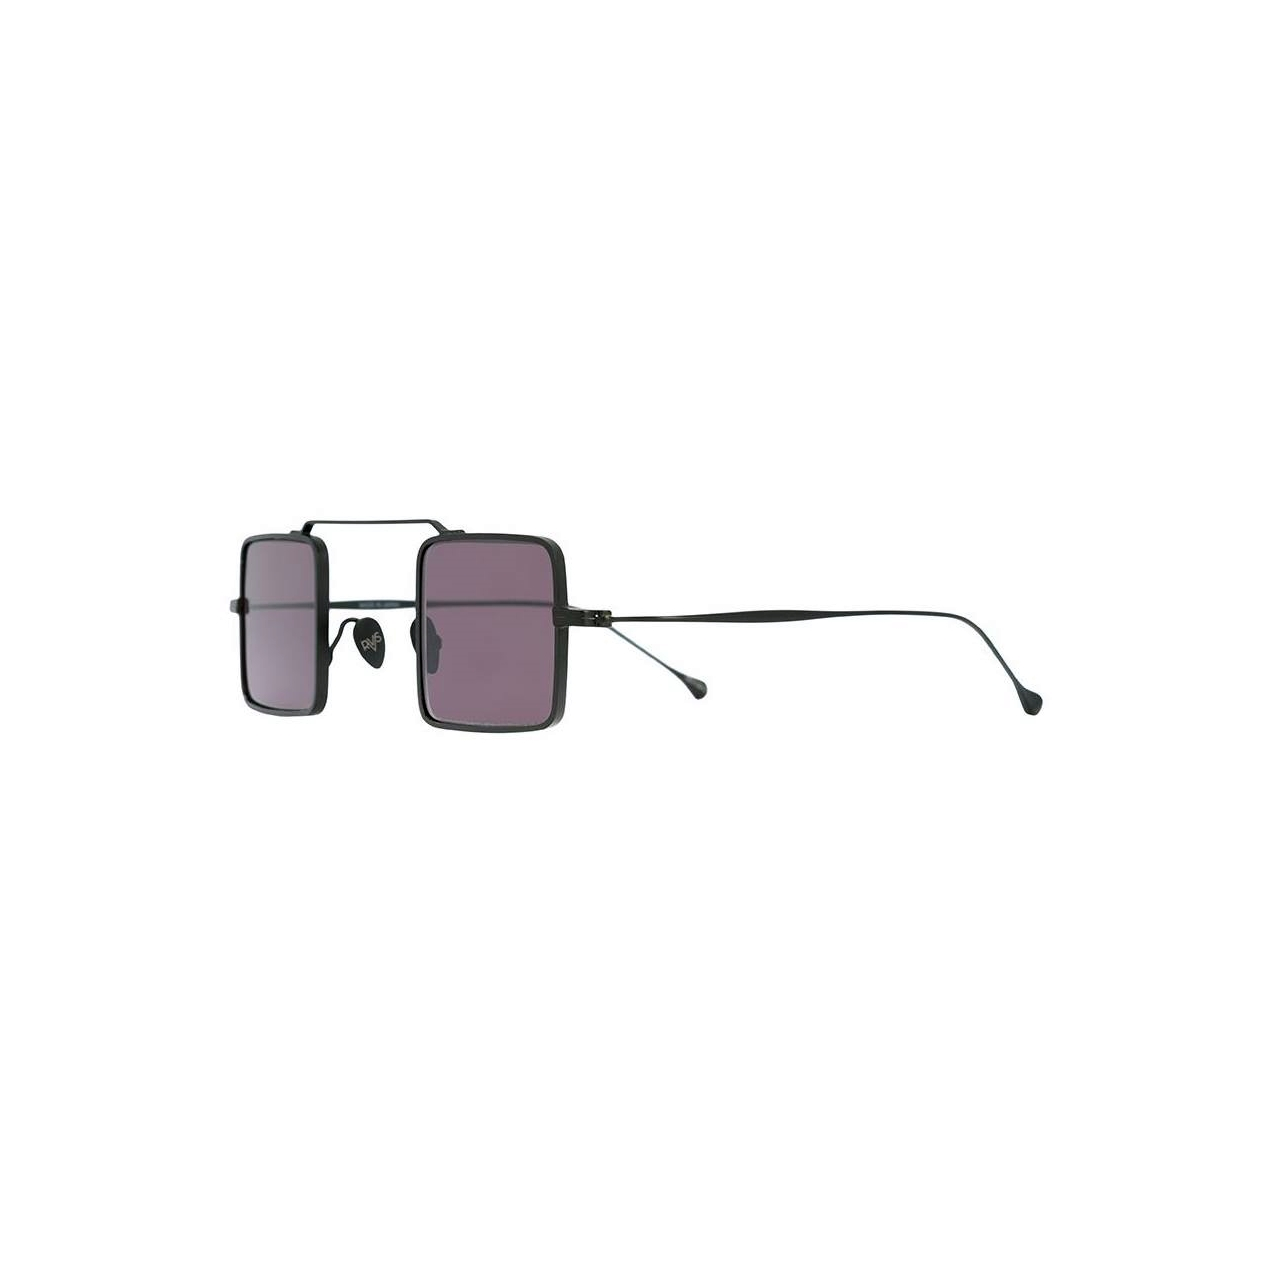 File:RVS Palladium 002 Sunglasses.jpg